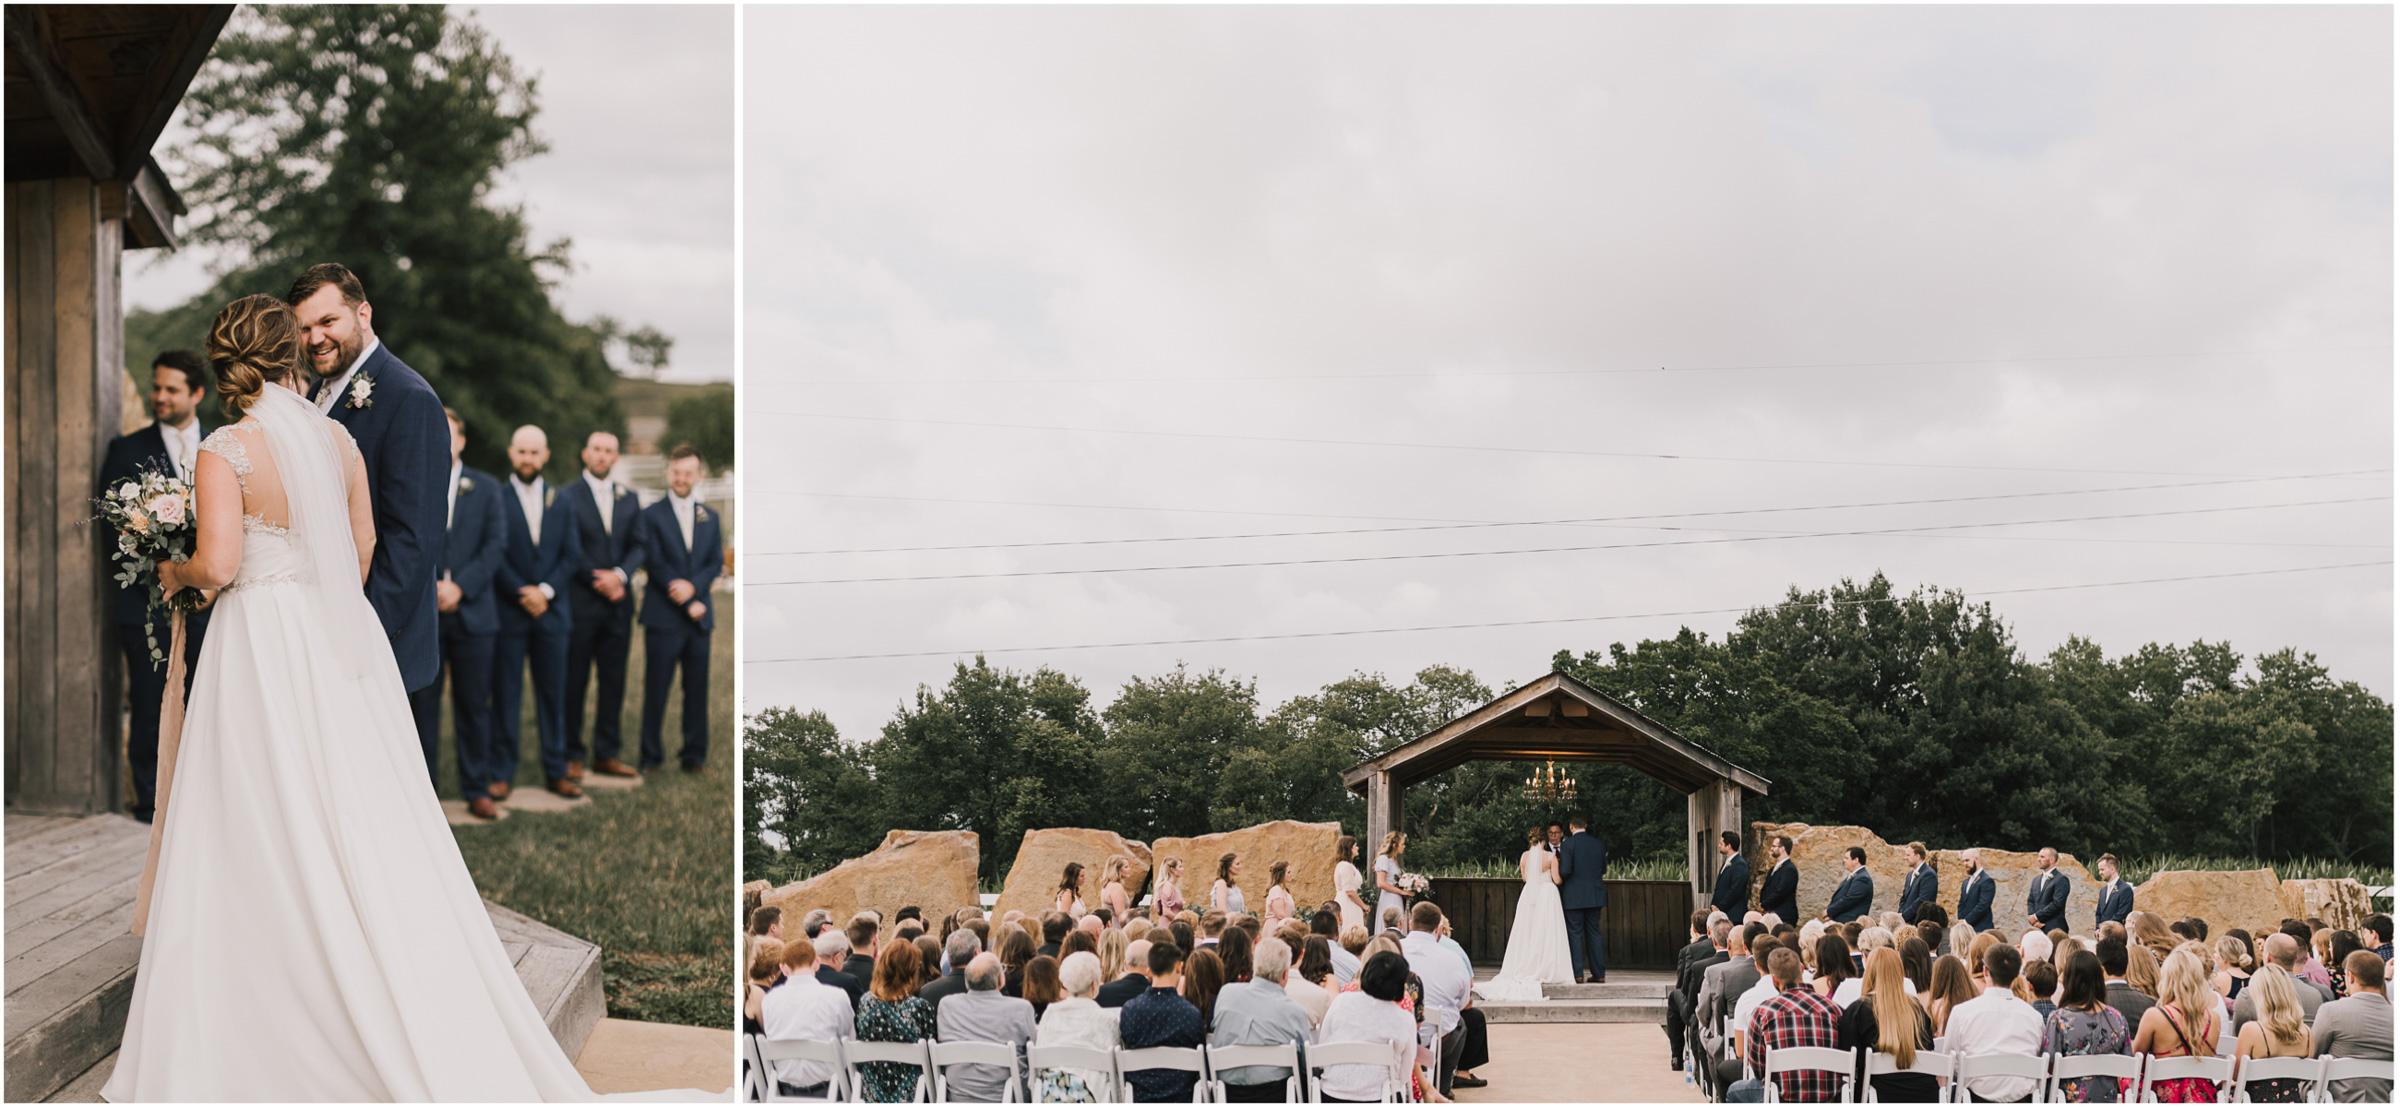 alyssa barletter photography summer odessa missouri wedding kansas city photographer-54.jpg